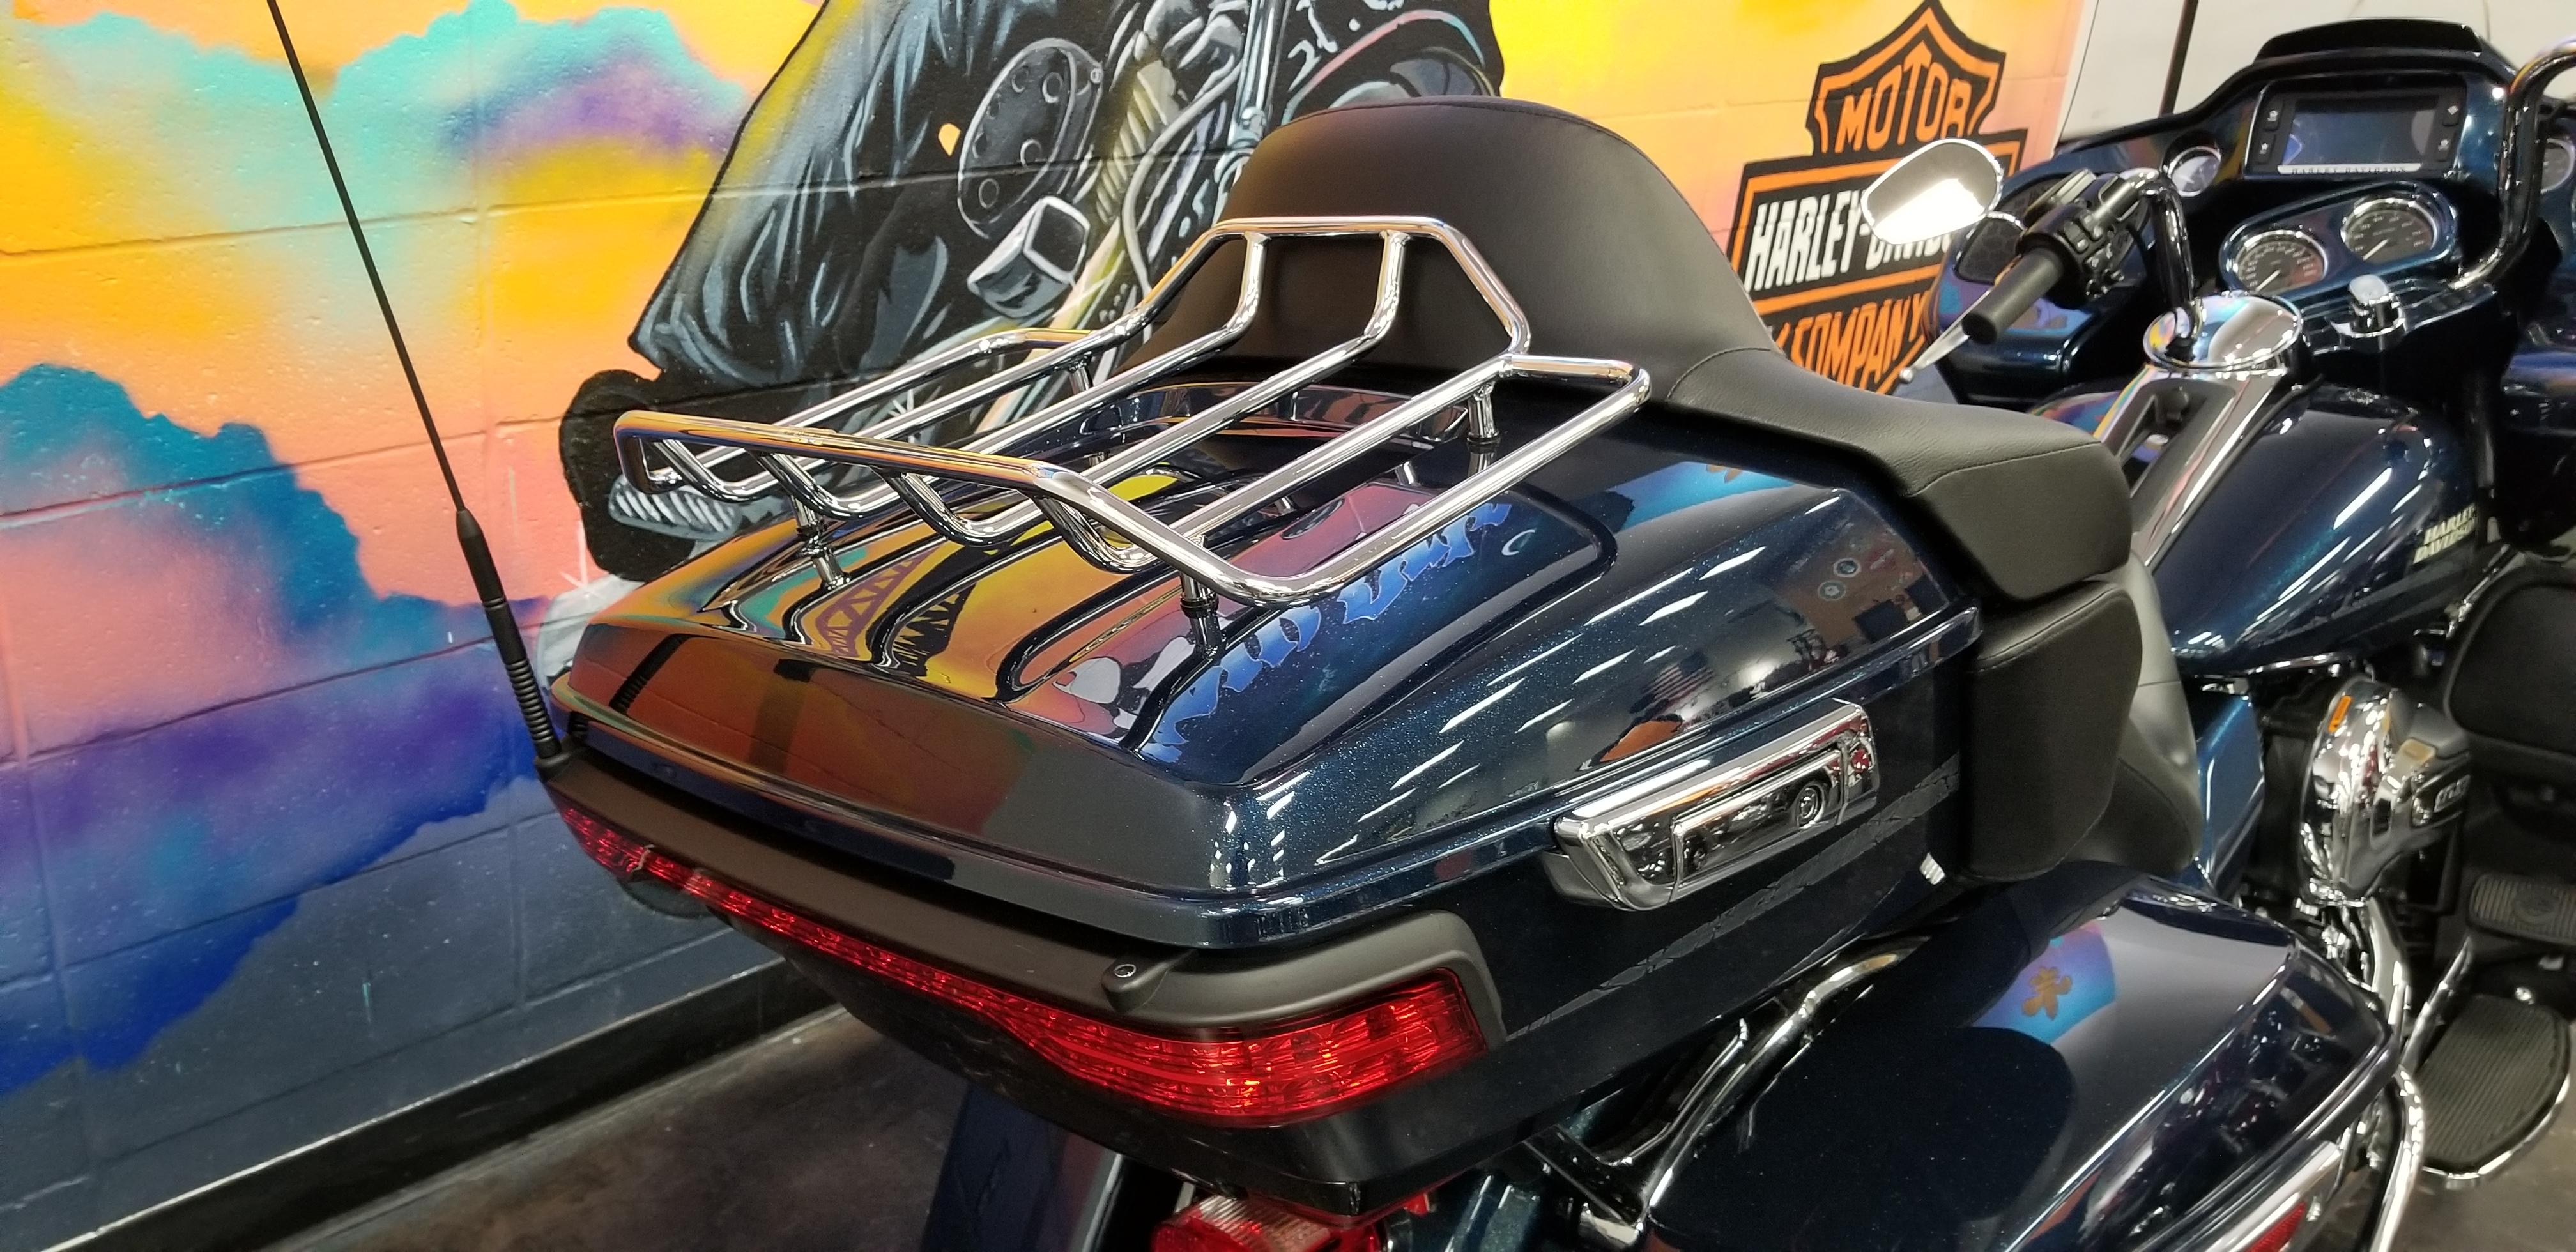 Pre-Owned 2016 Harley-Davidson Road Glide Ultra FLTRU